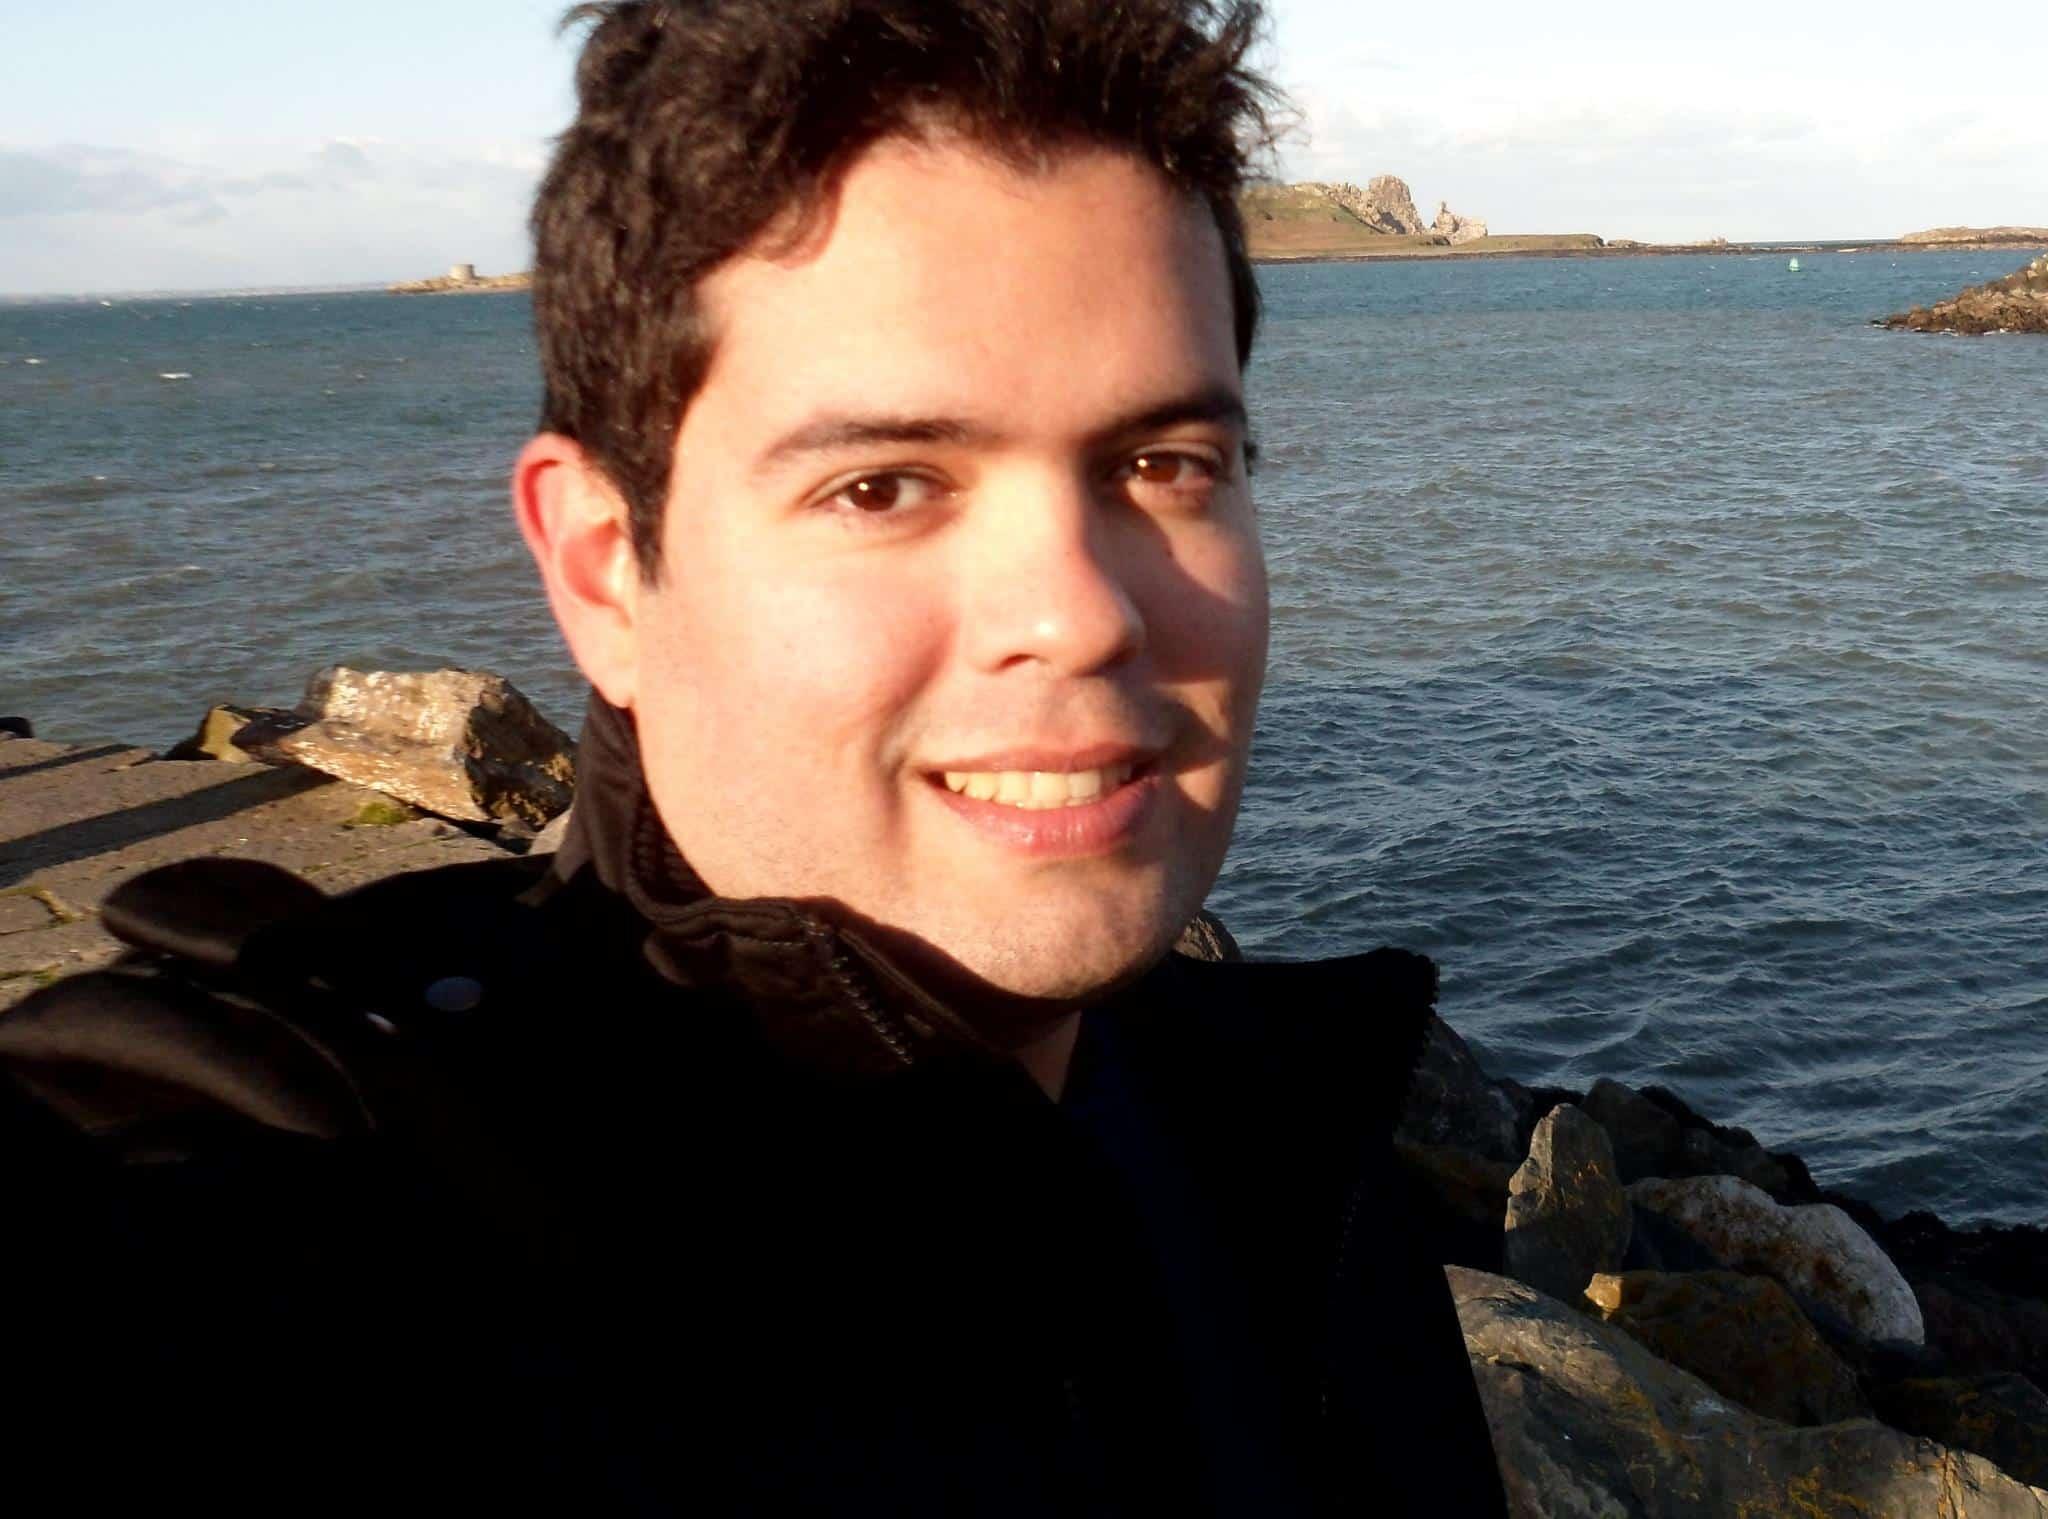 Gustavo Coutinho